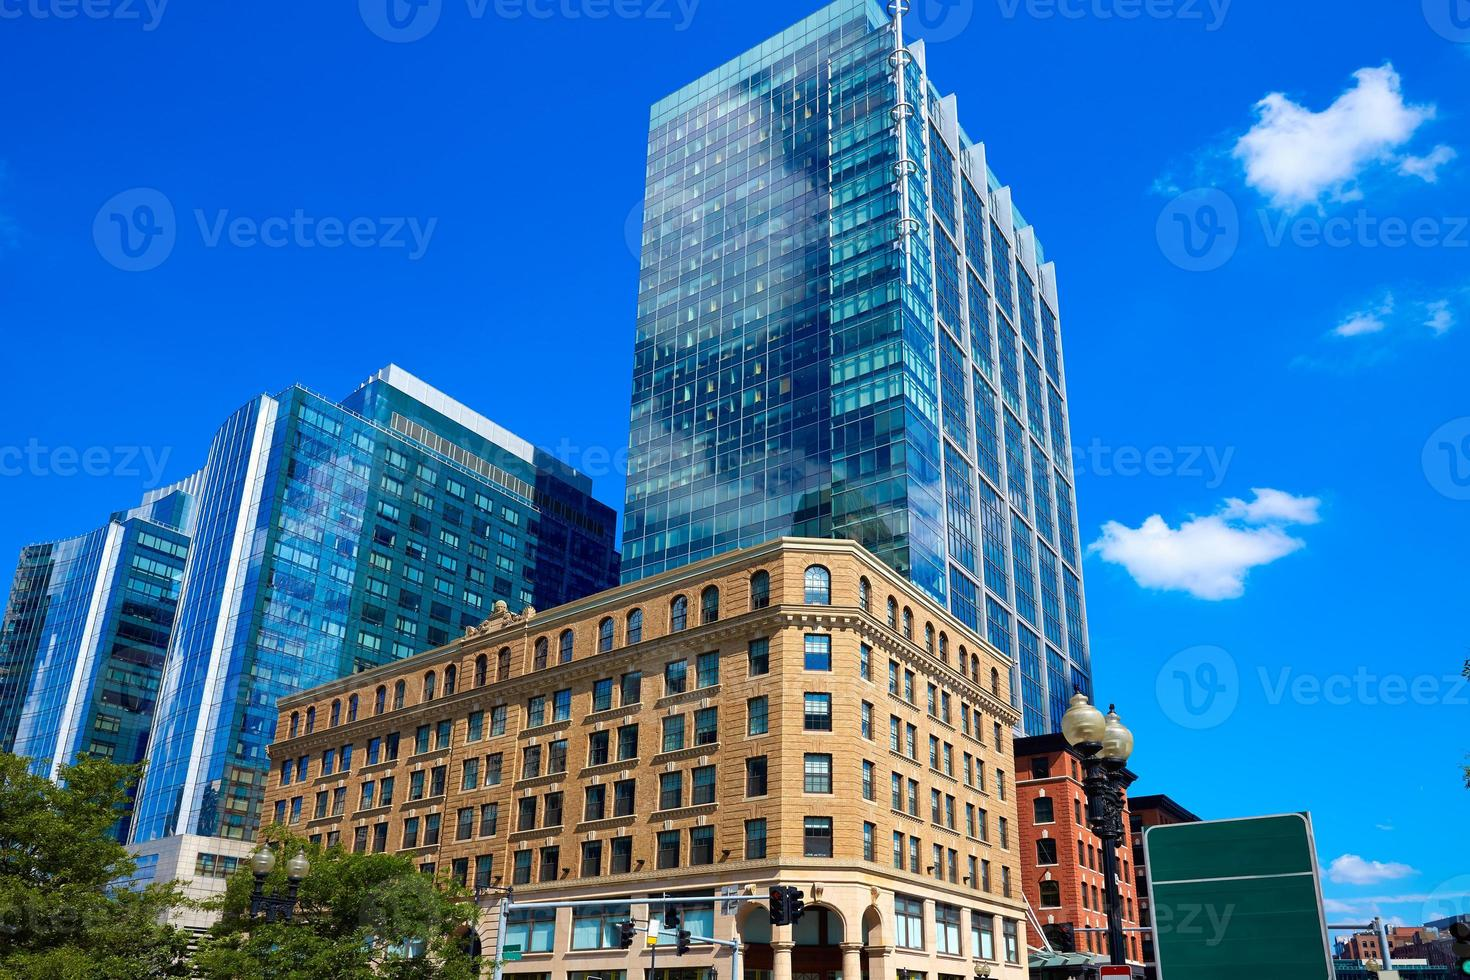 boston massachusetts downtown buidings foto